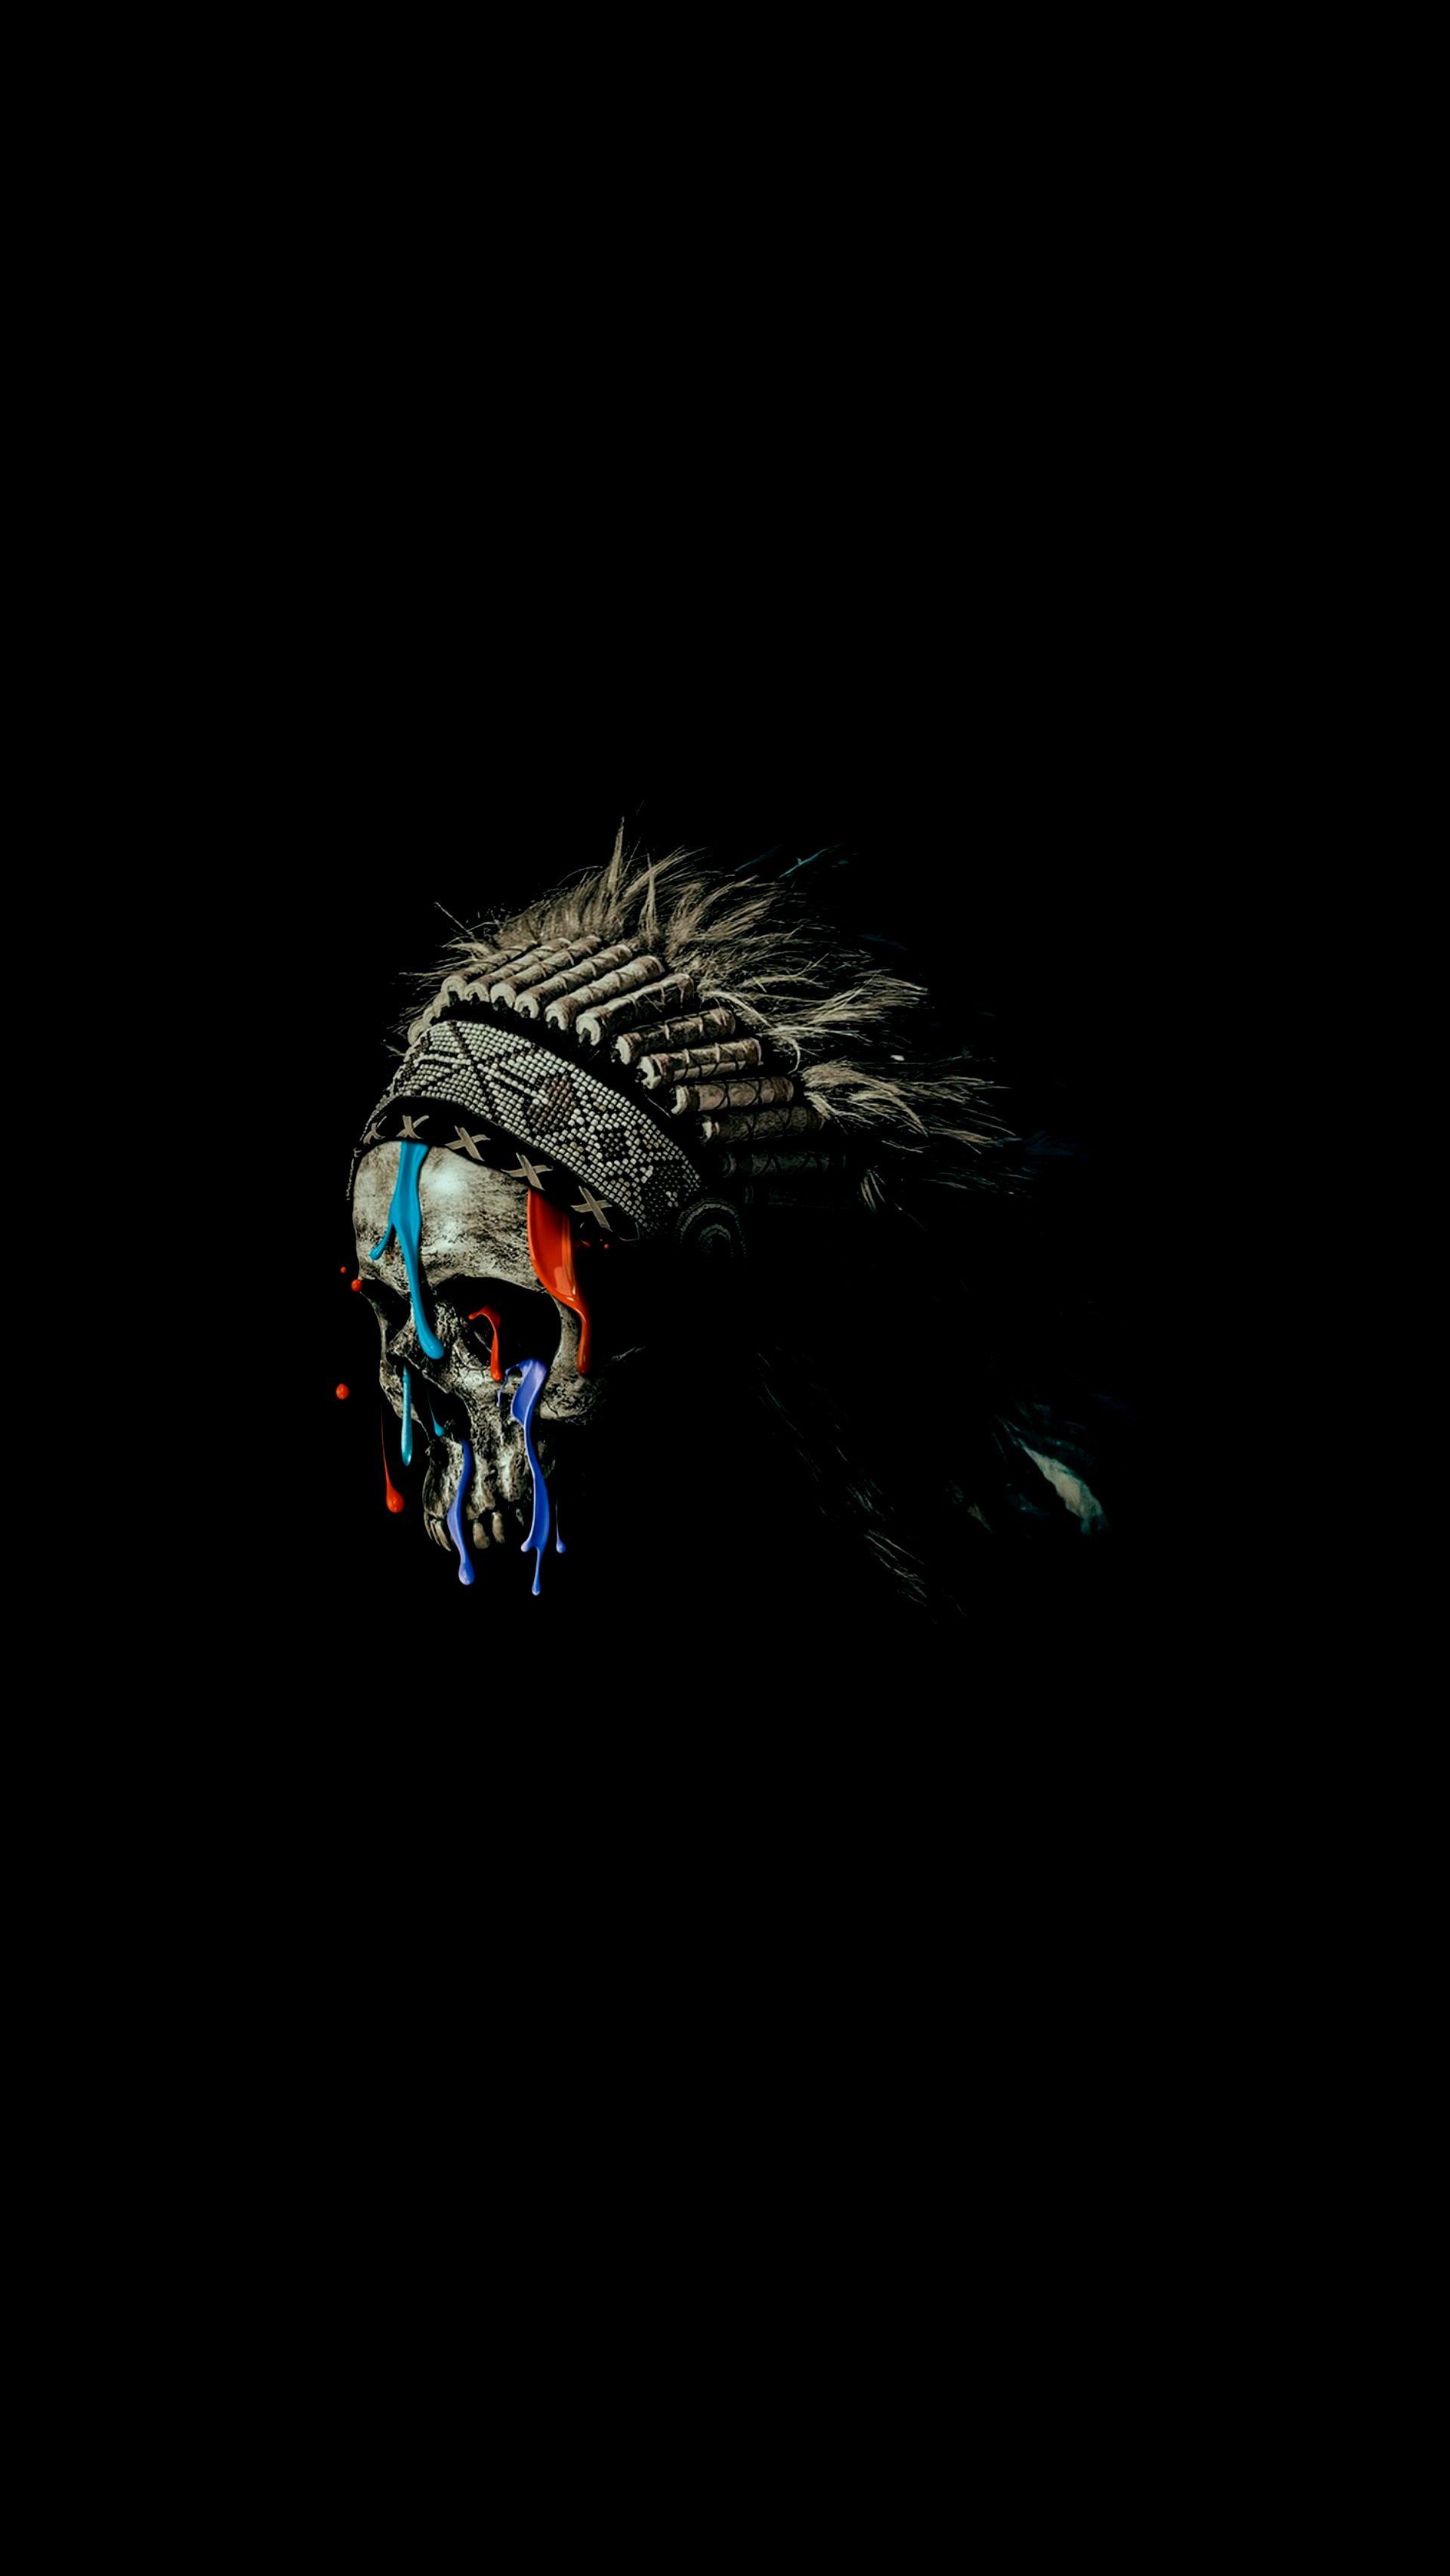 Focus Wallpaper Iphone X Native American Skull Iphone Wallpaper Iphone Wallpapers